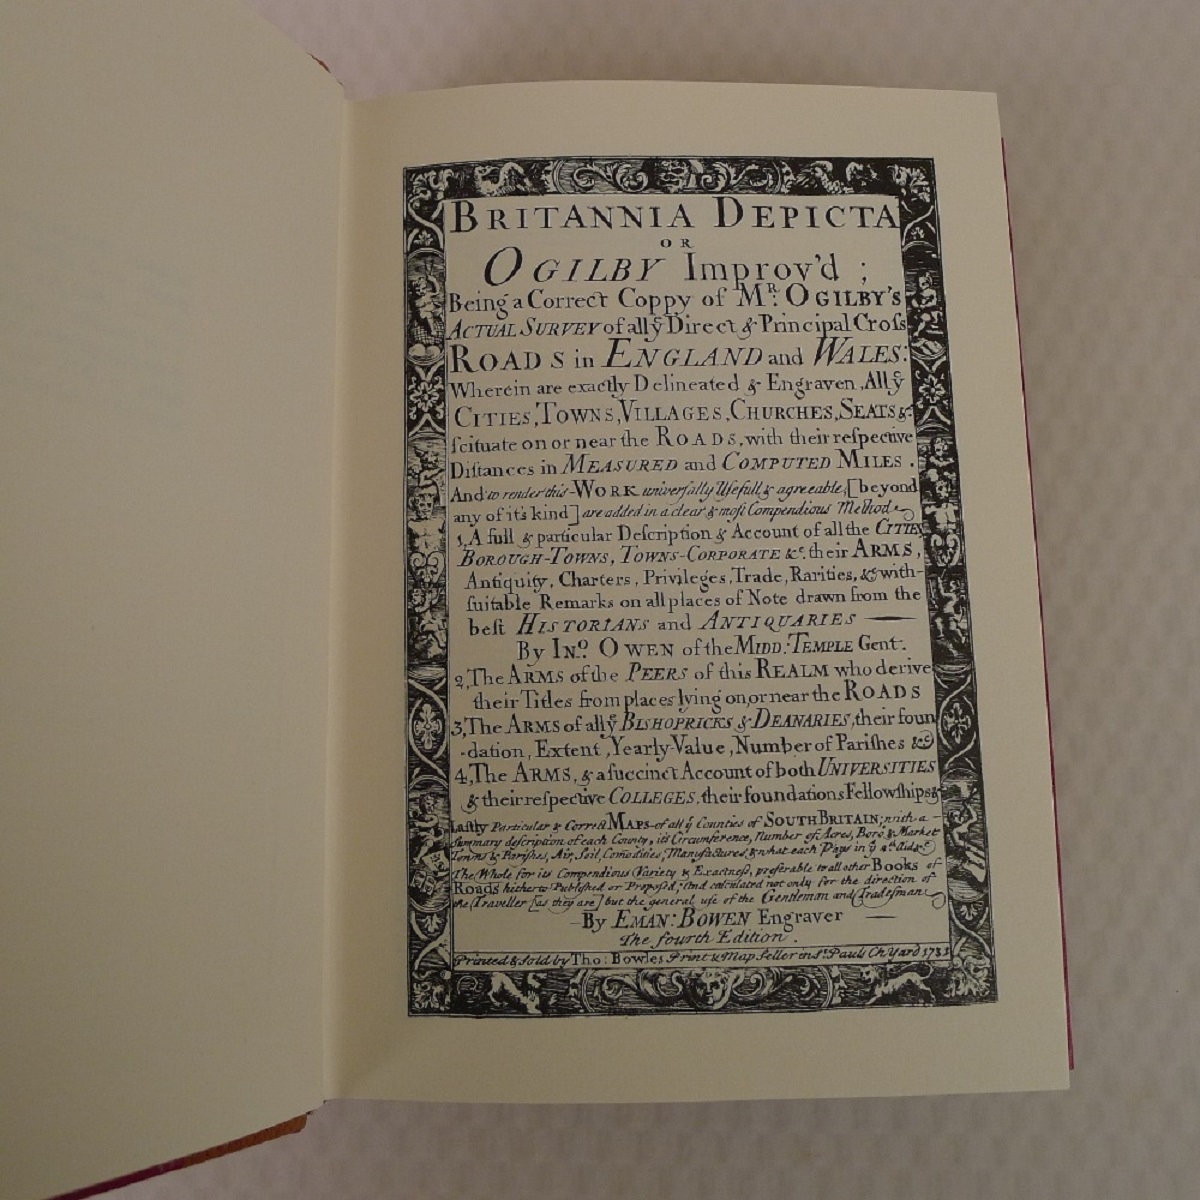 A facsimile reprint of Britannia Depicta 1731 by Emmanuel Bowen published by Britannia - Image 6 of 7